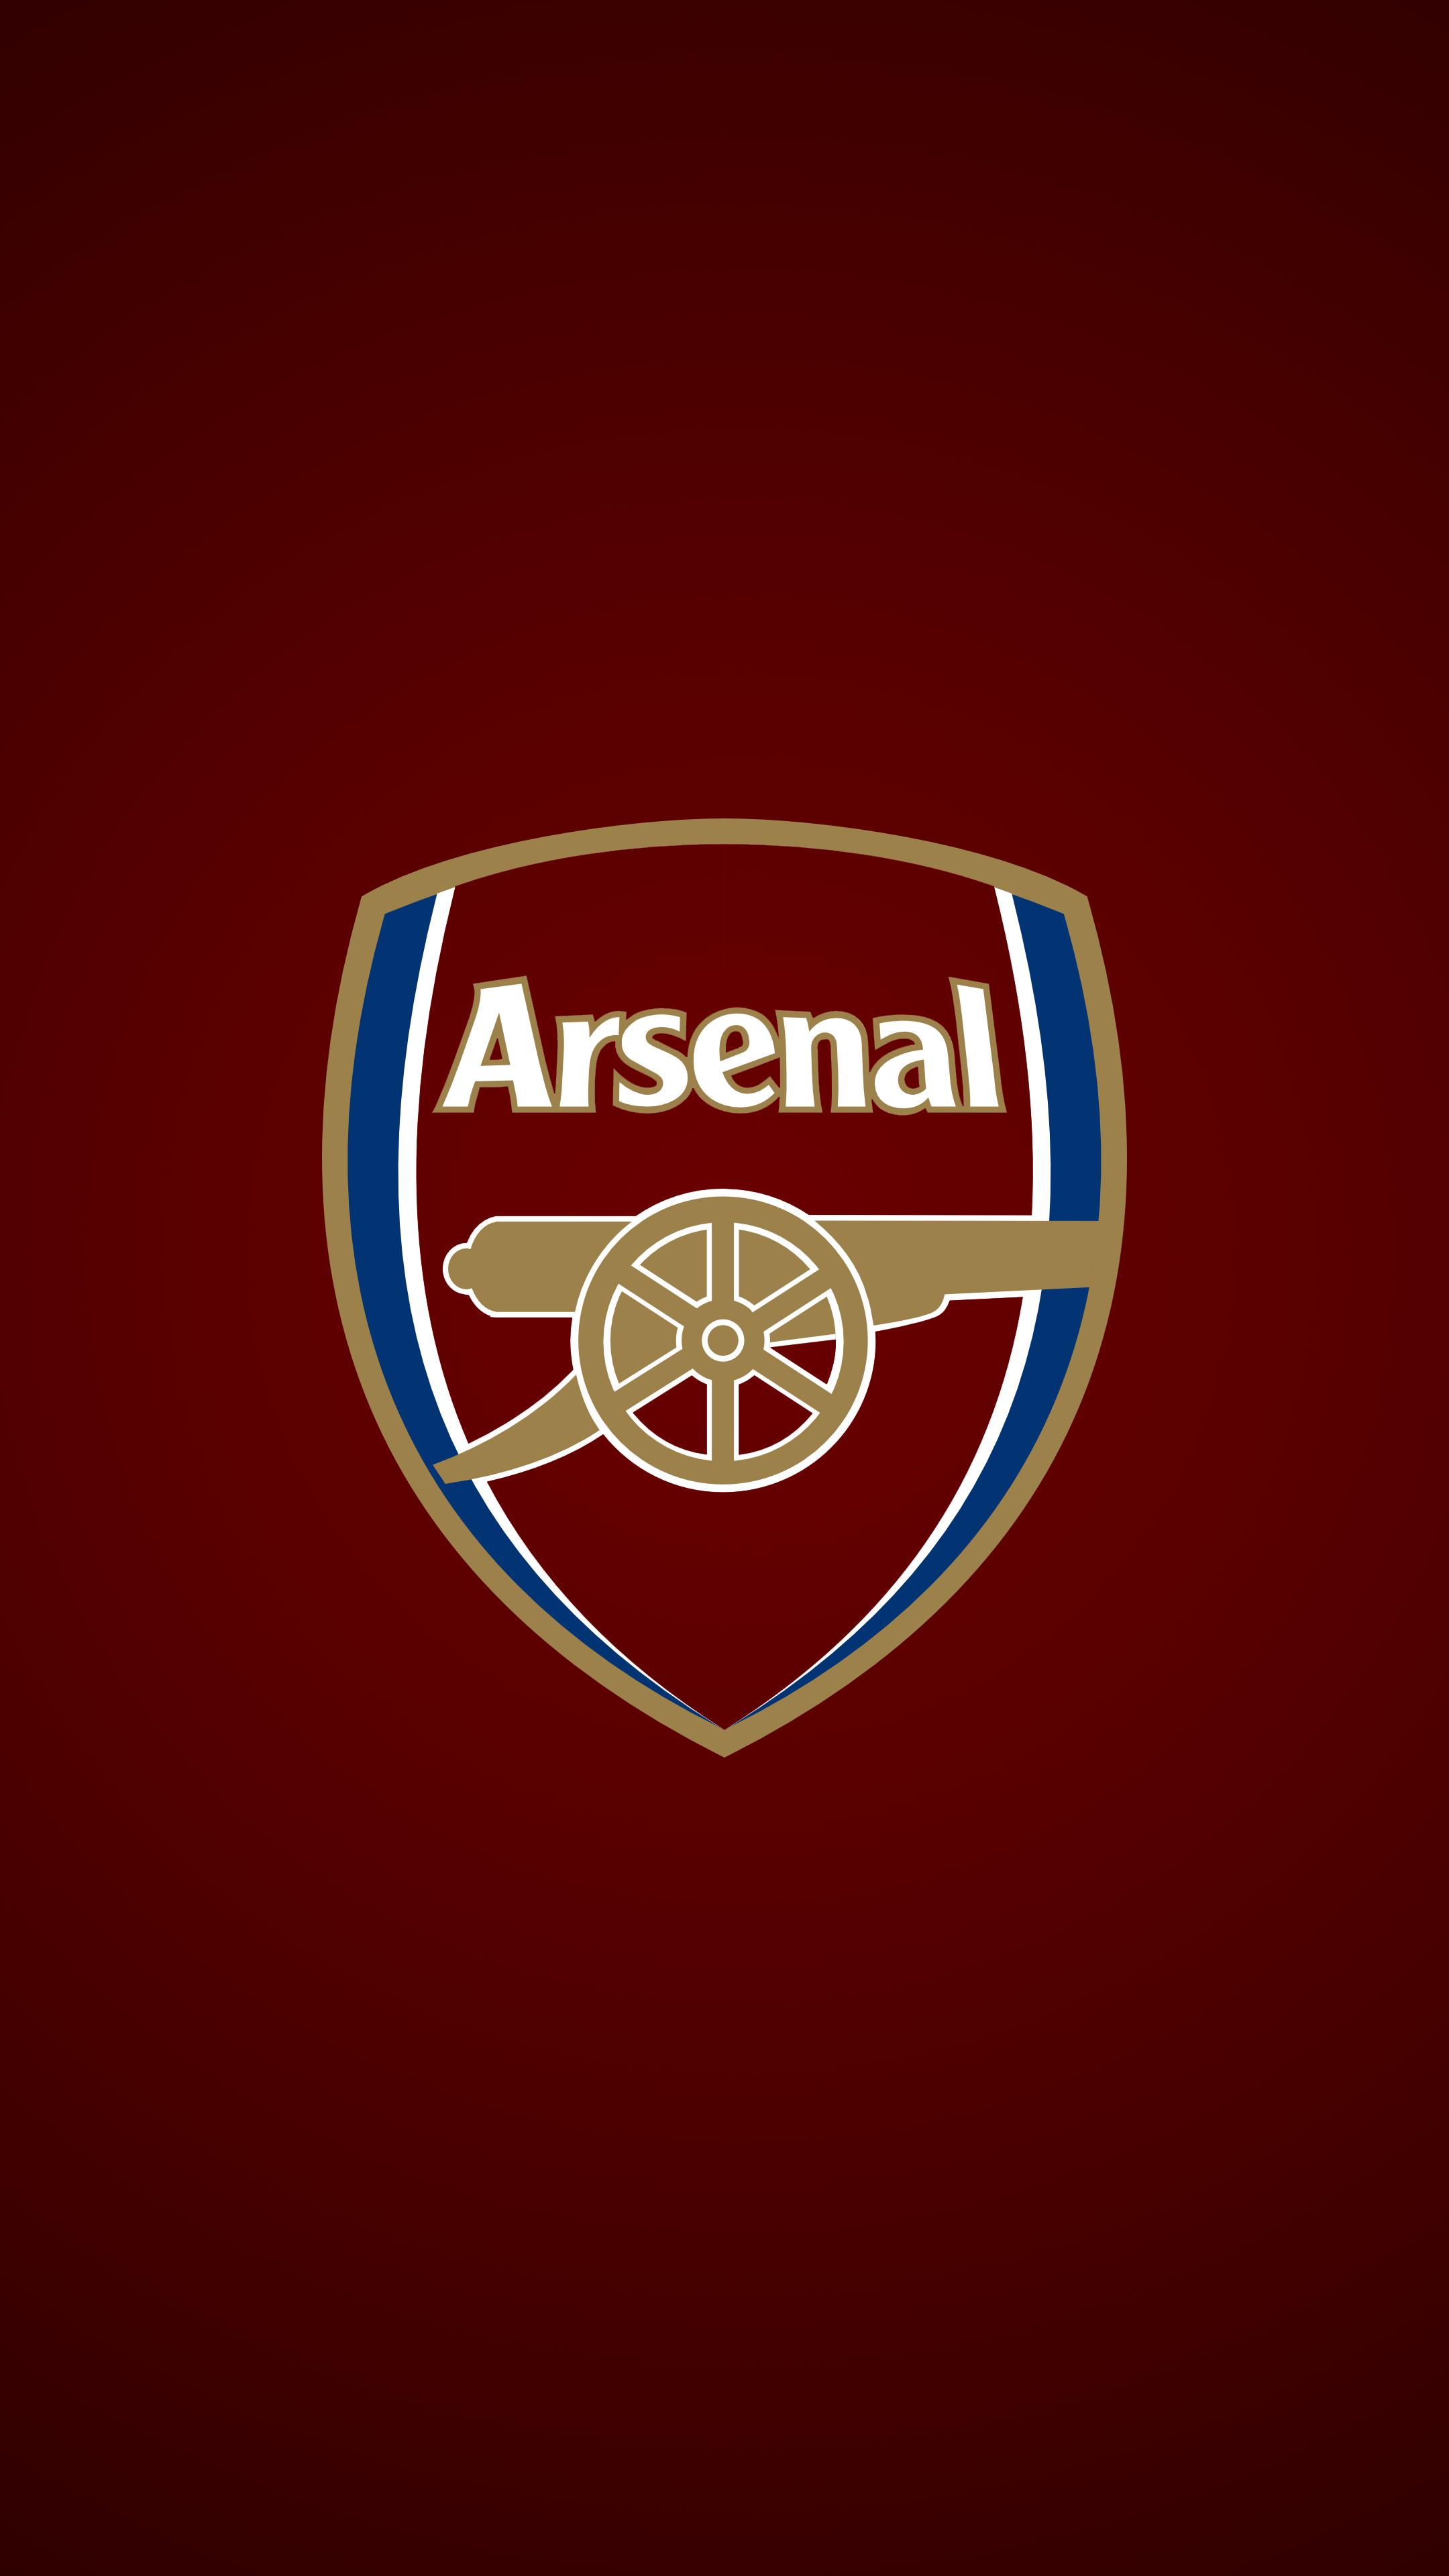 Arsenal 4k Wallpaper Pahlawan Super Olahraga Desain Logo